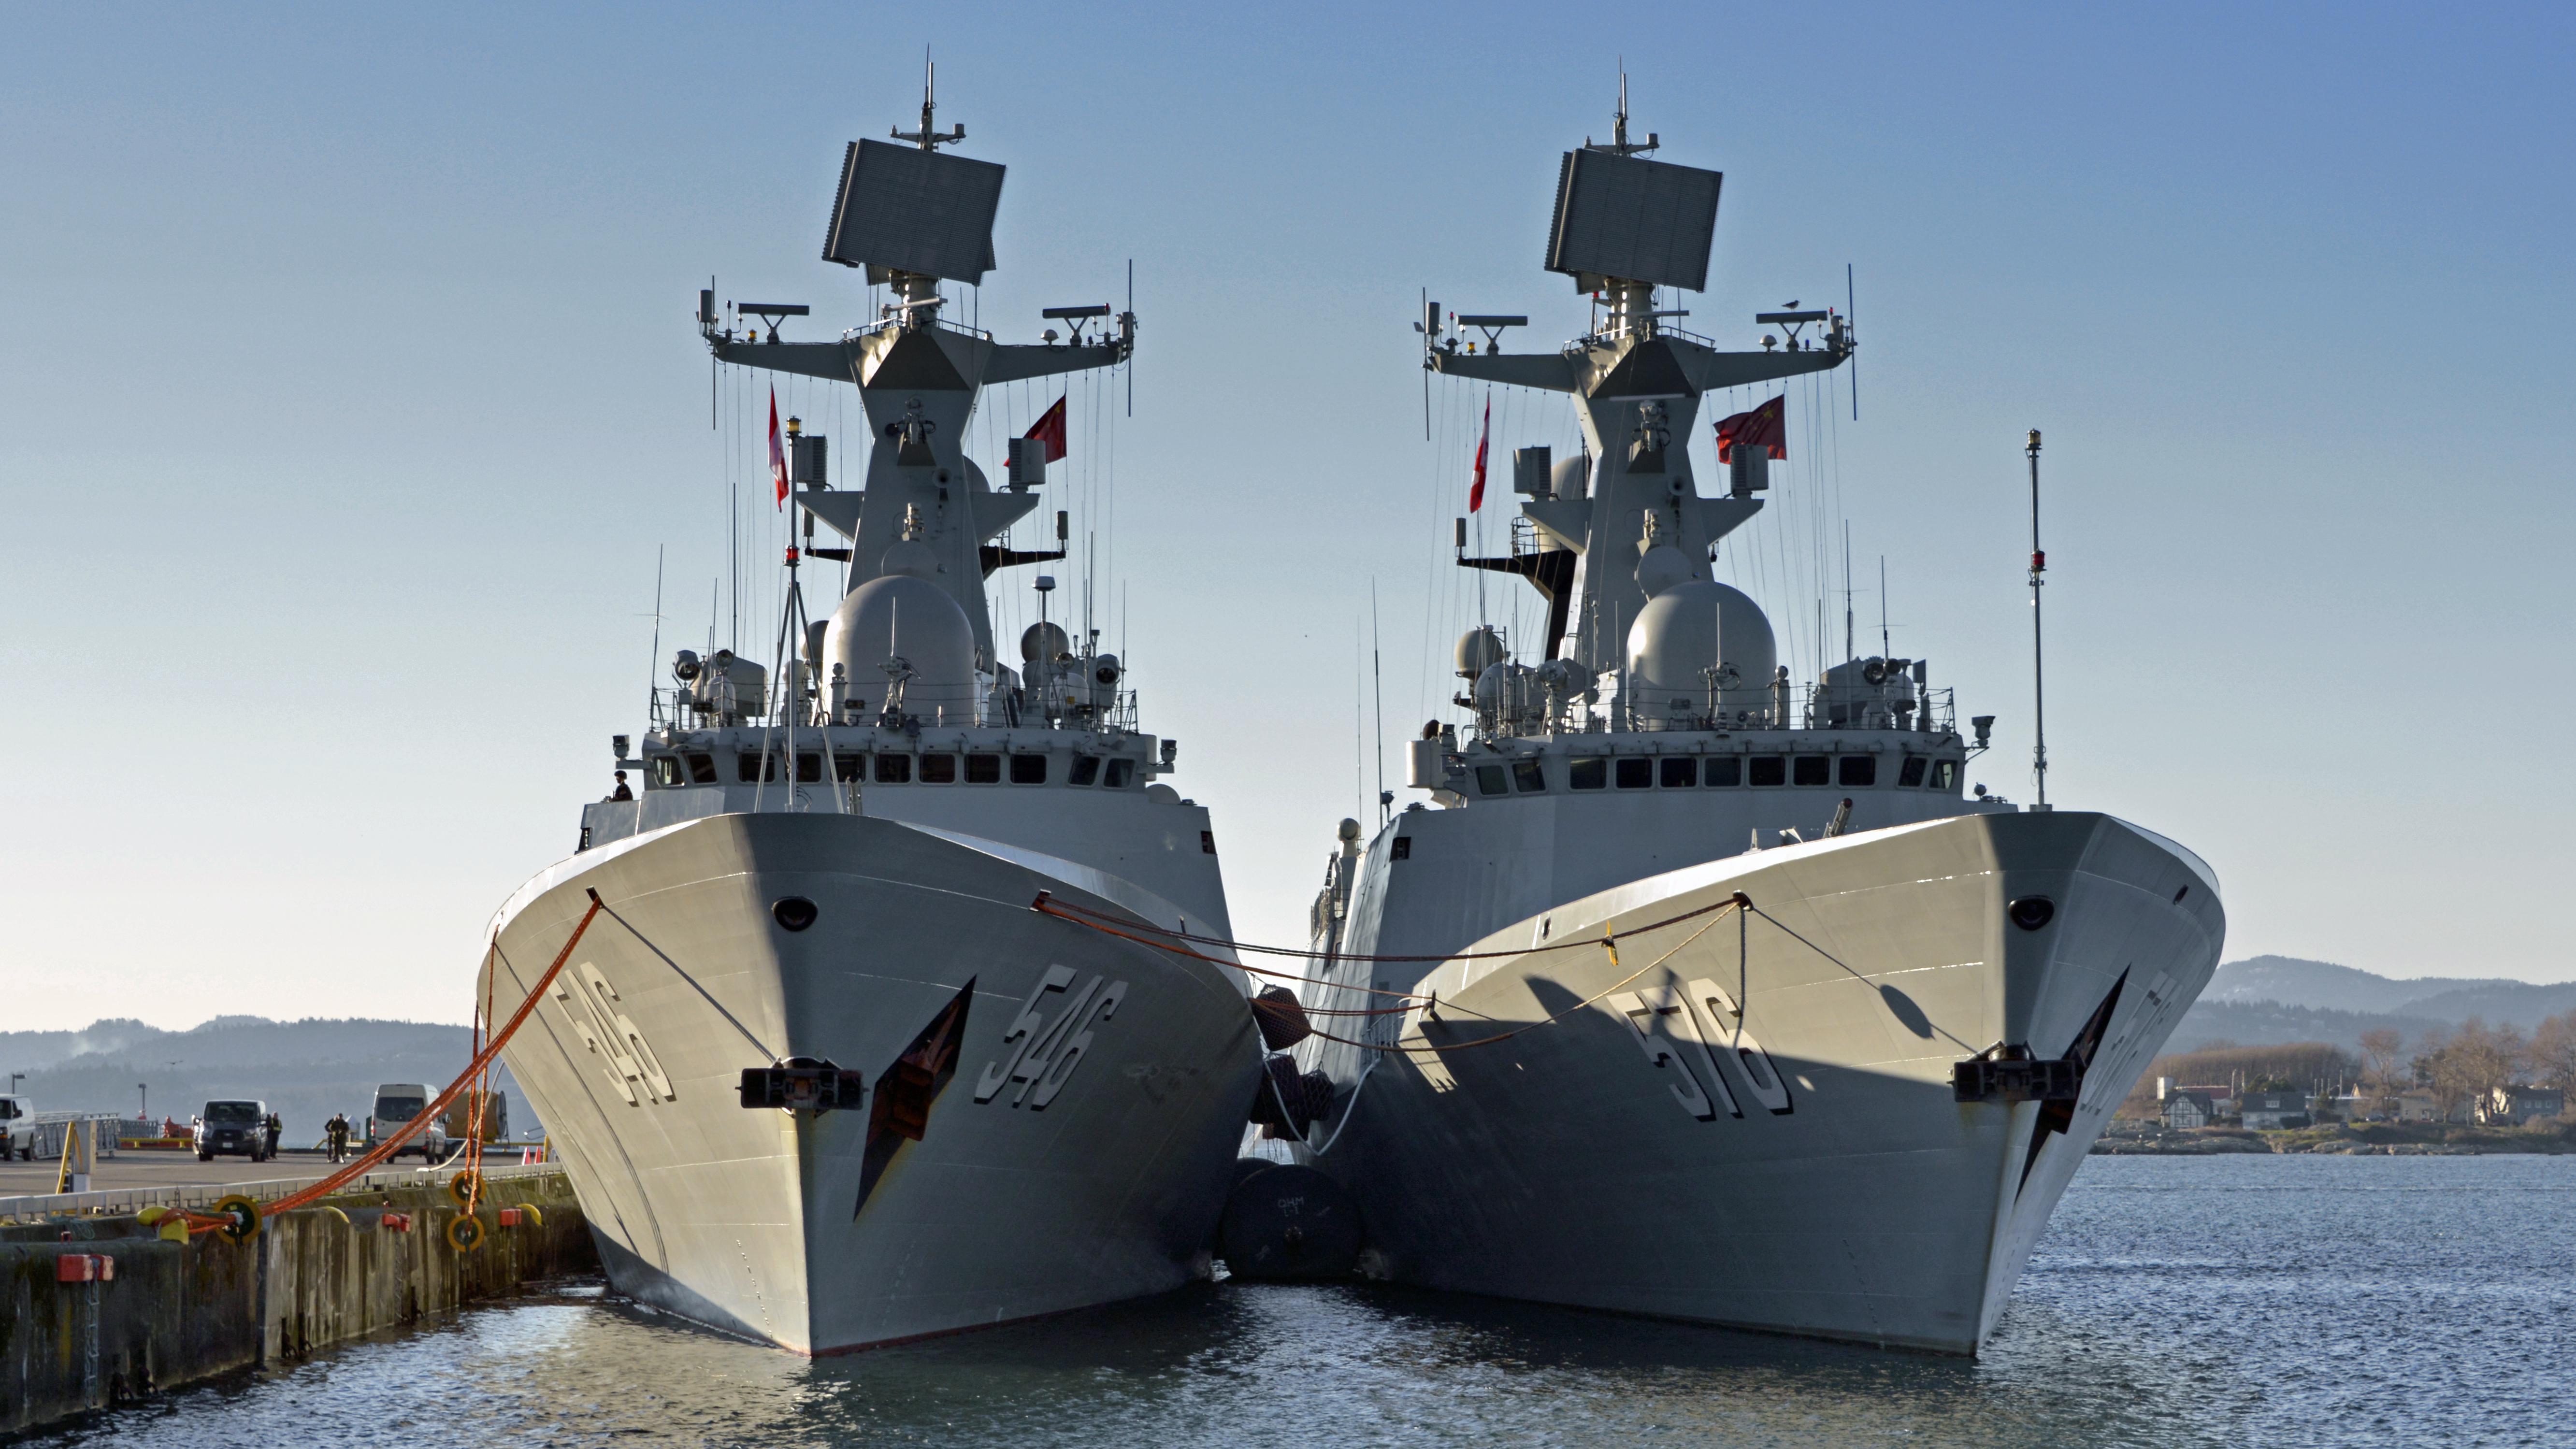 Marine chinoise - Chinese navy - Page 9 31322626060_c9f4e9c08f_o